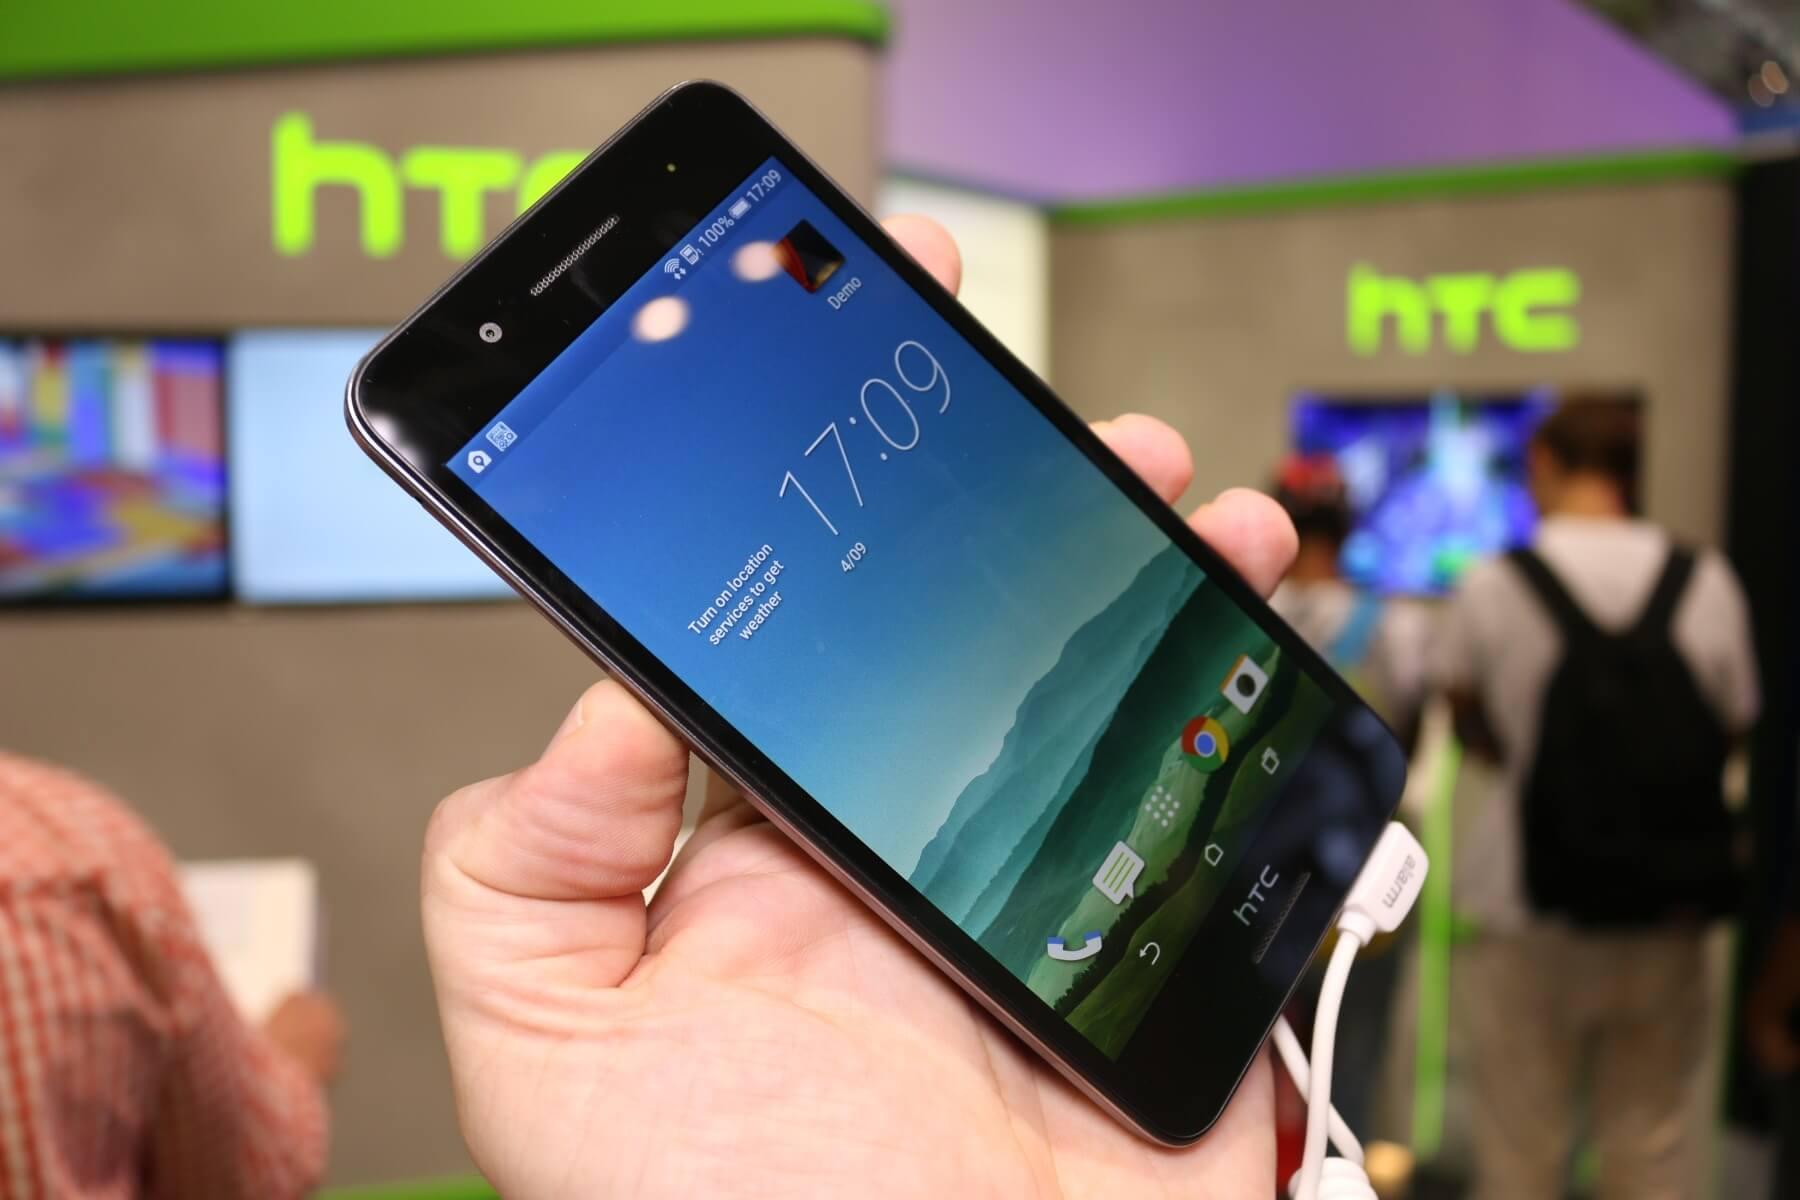 HTC DESIRE 300 USER MANUAL Pdf Download